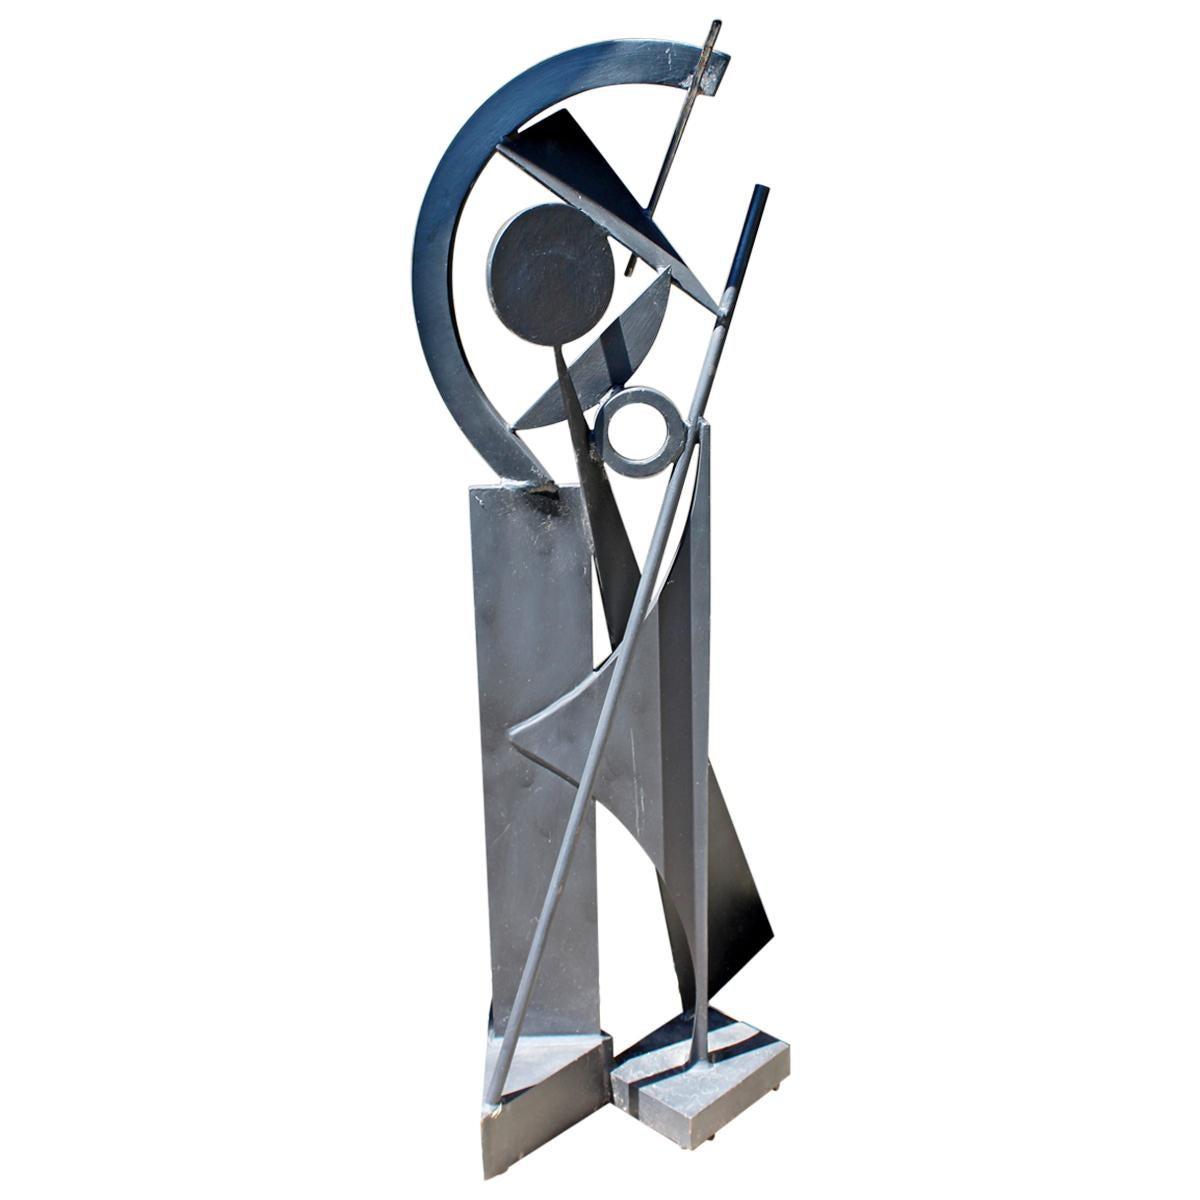 Modernist Forged Black Metal Abstract Floor Sculpture Robert Hansen Calder Style